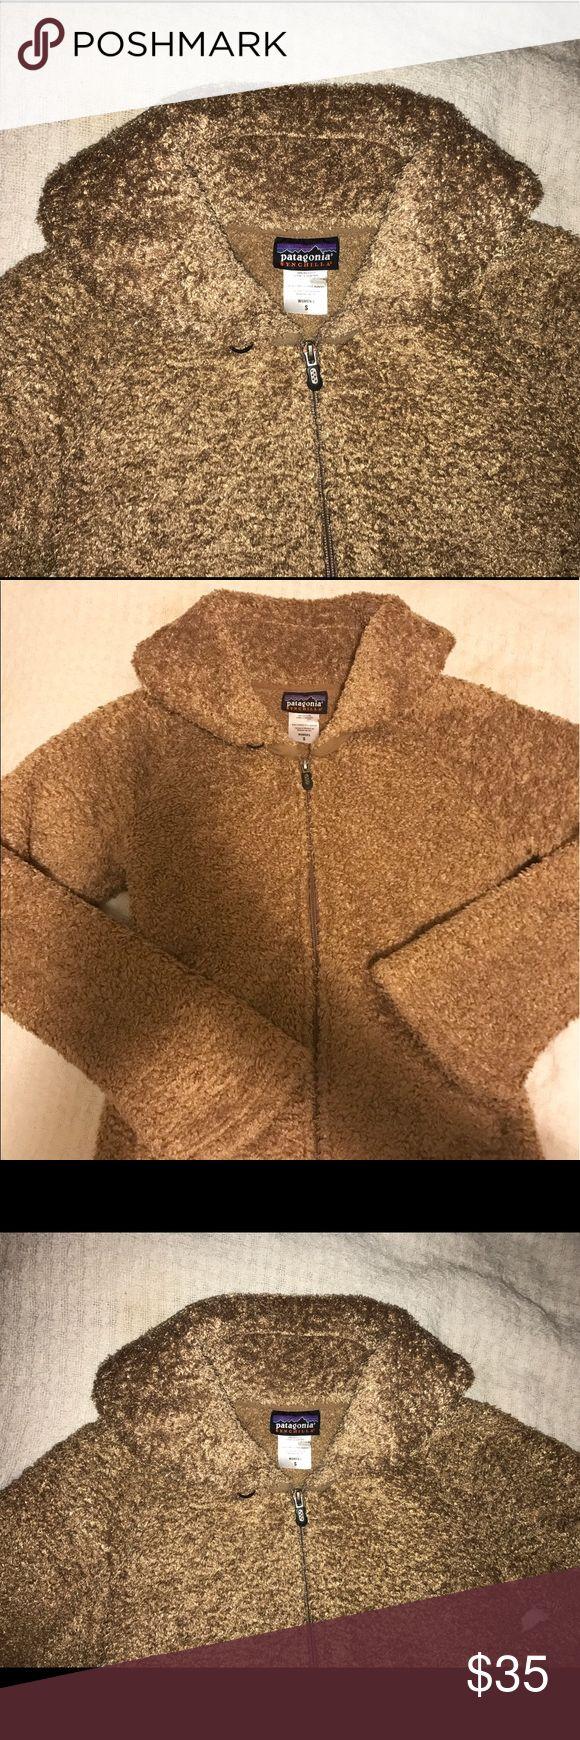 Patagonia Synchilla Jacket Great condition ☔️ Patagonia Jackets & Coats